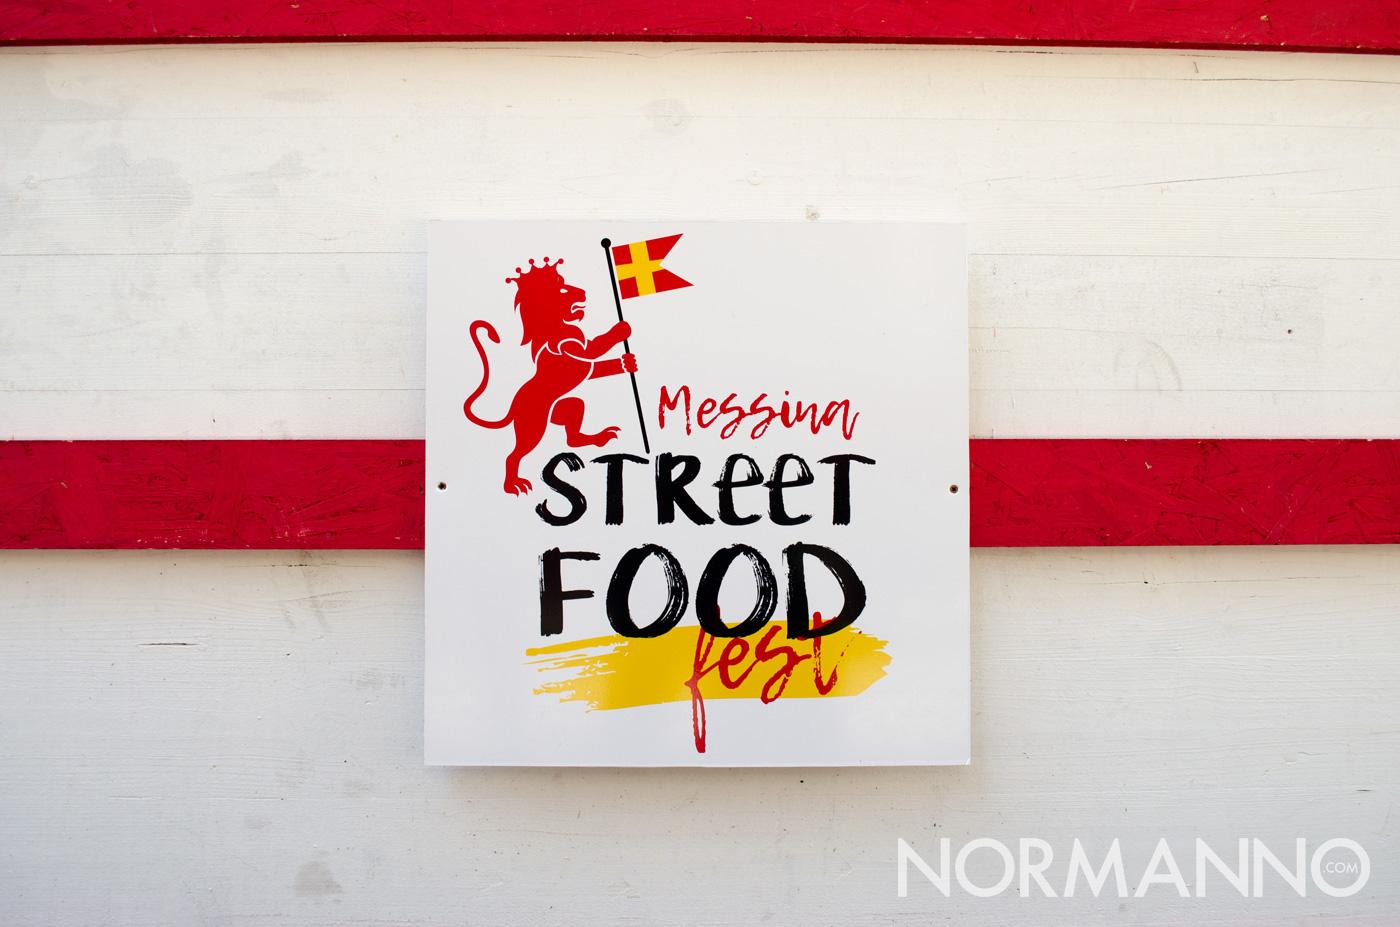 Dettaglio stand con logo - Messina Street Food Fest 2017